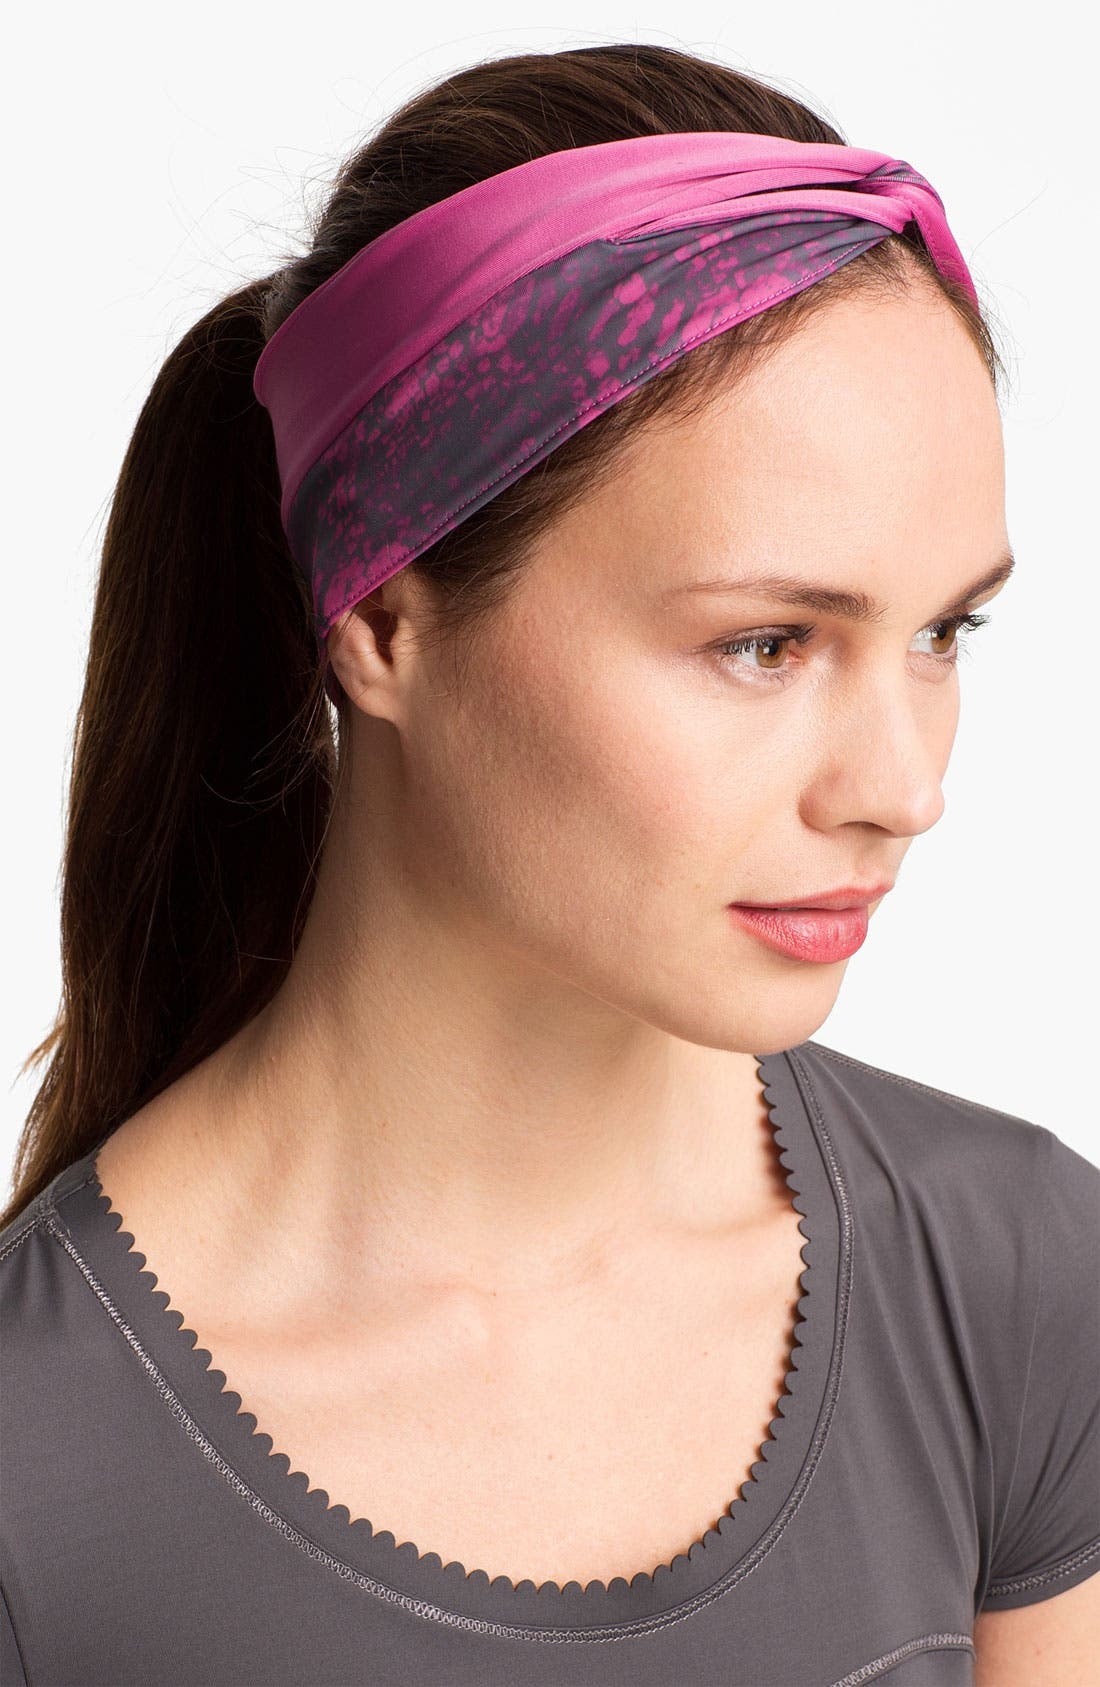 Main Image - Under Armour 'Twisty Tank' Headband